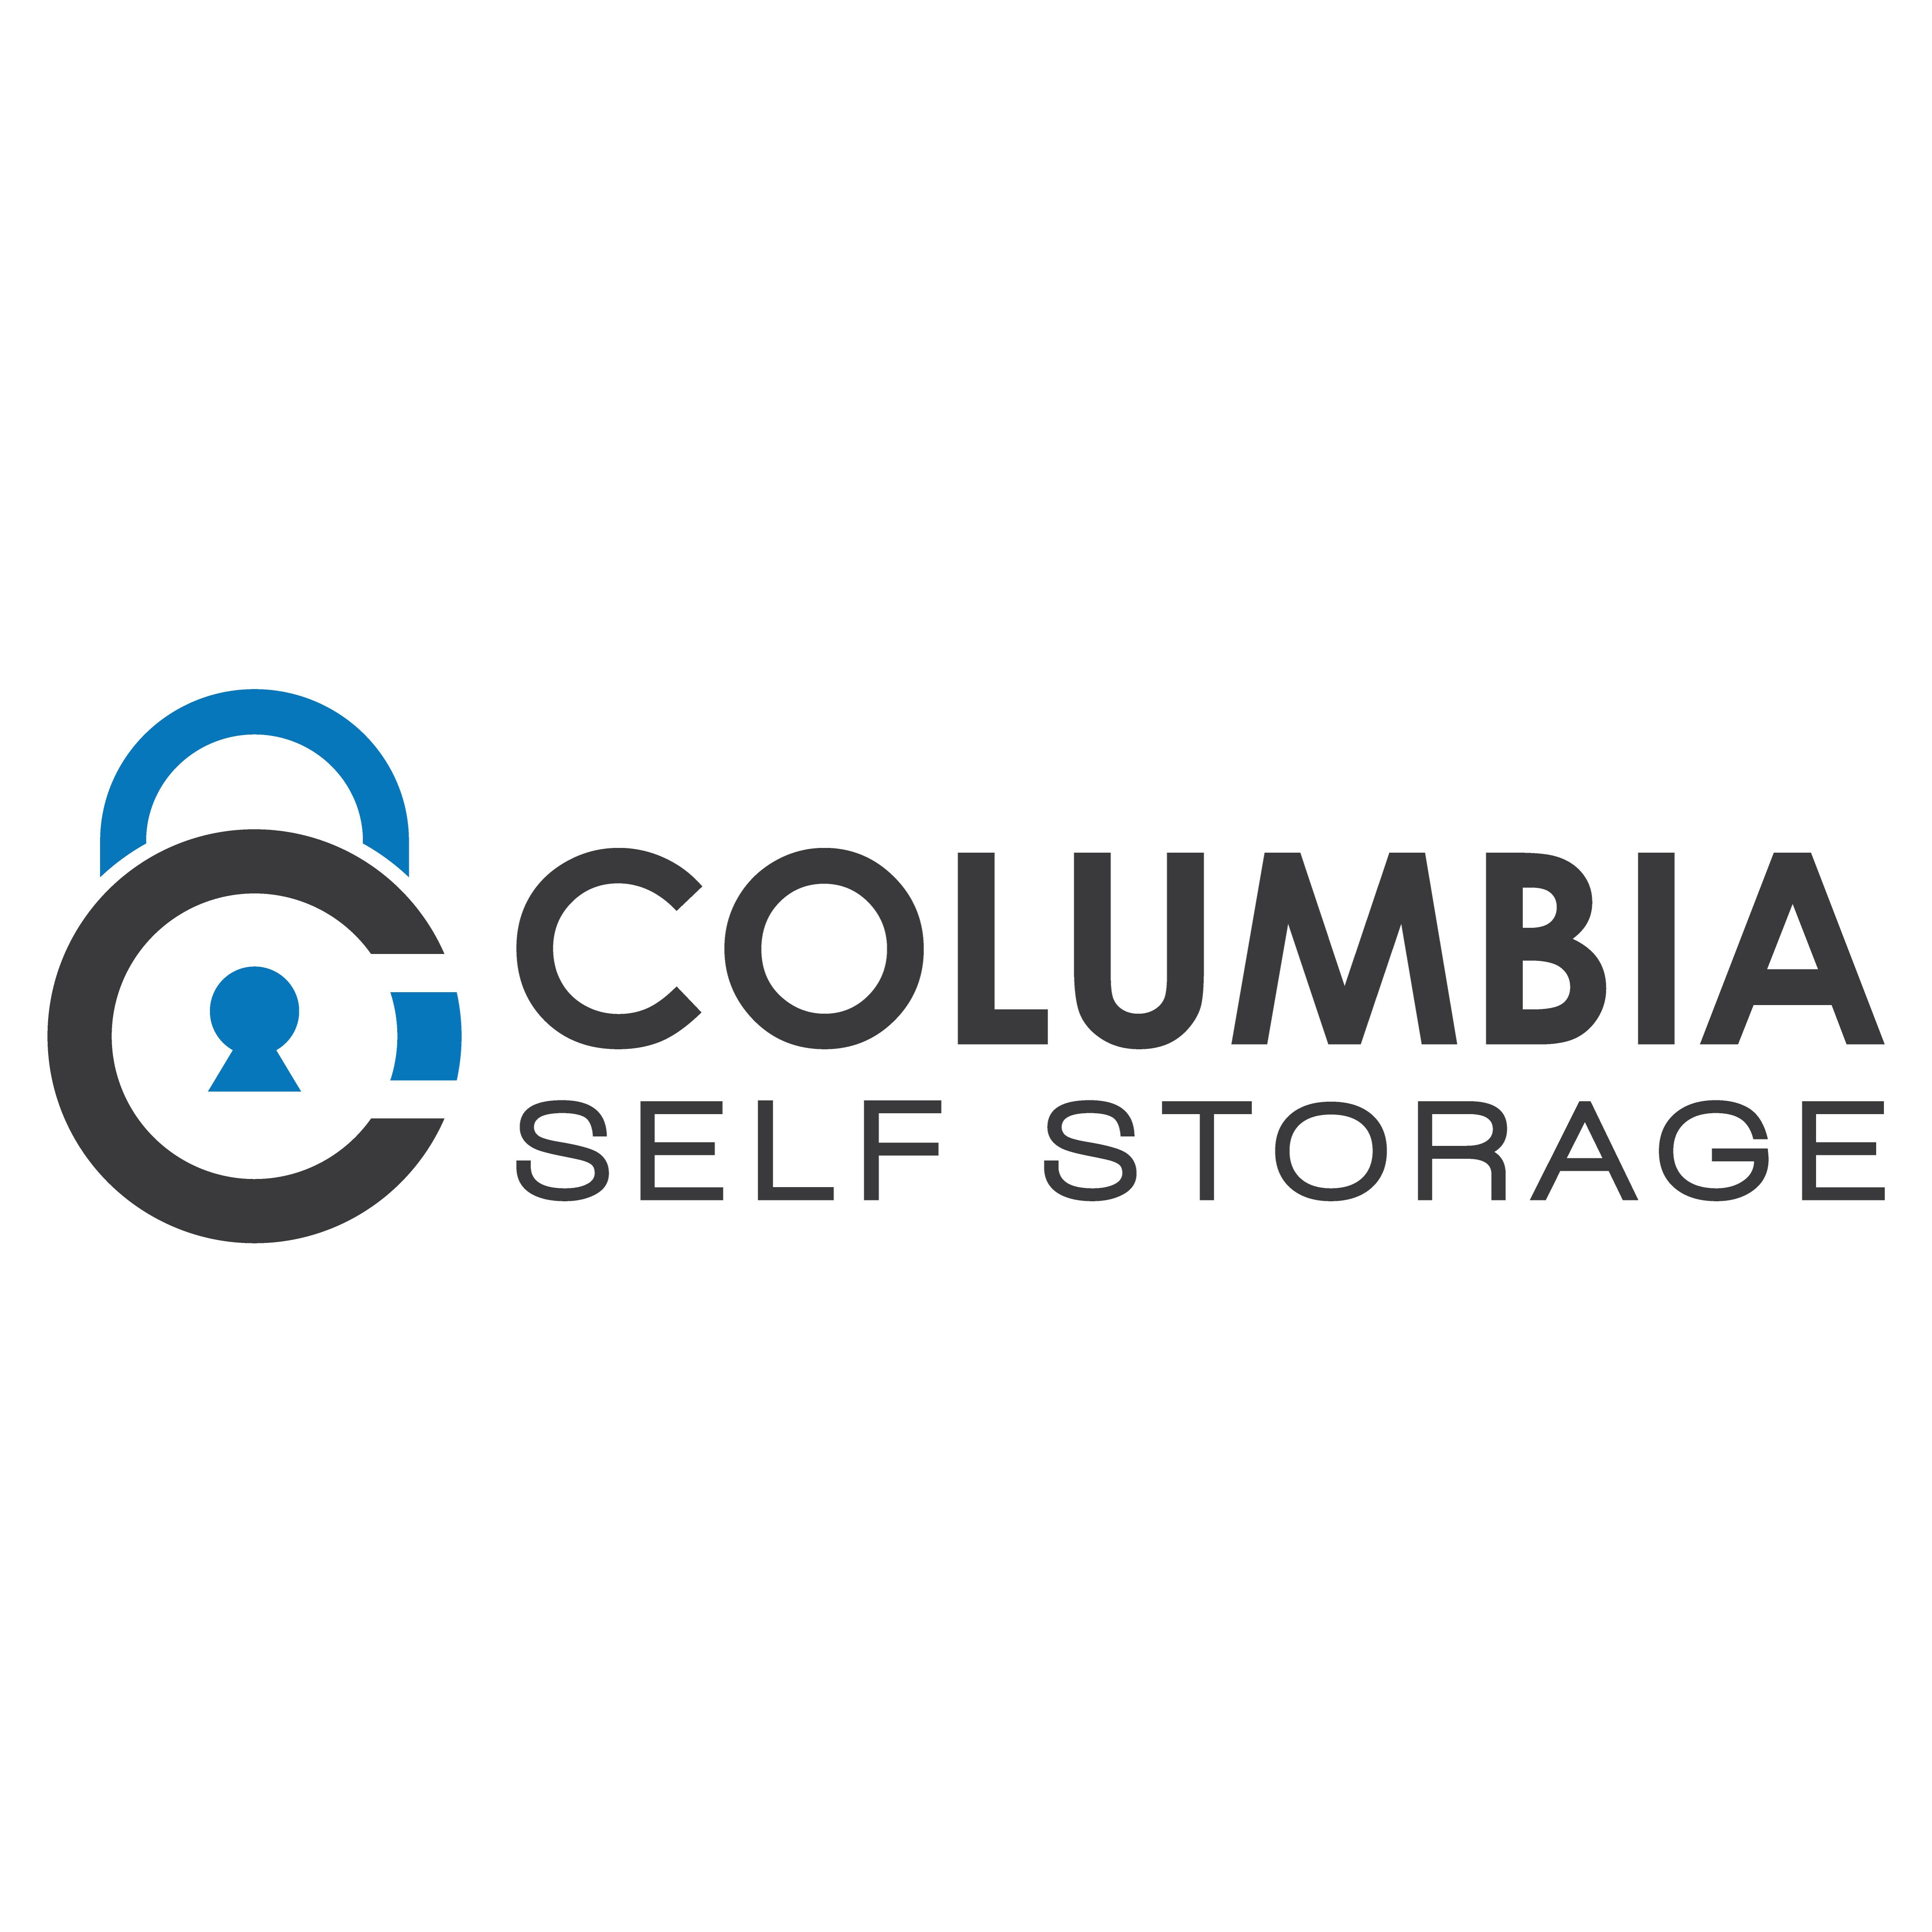 Columbia Self Storage image 0